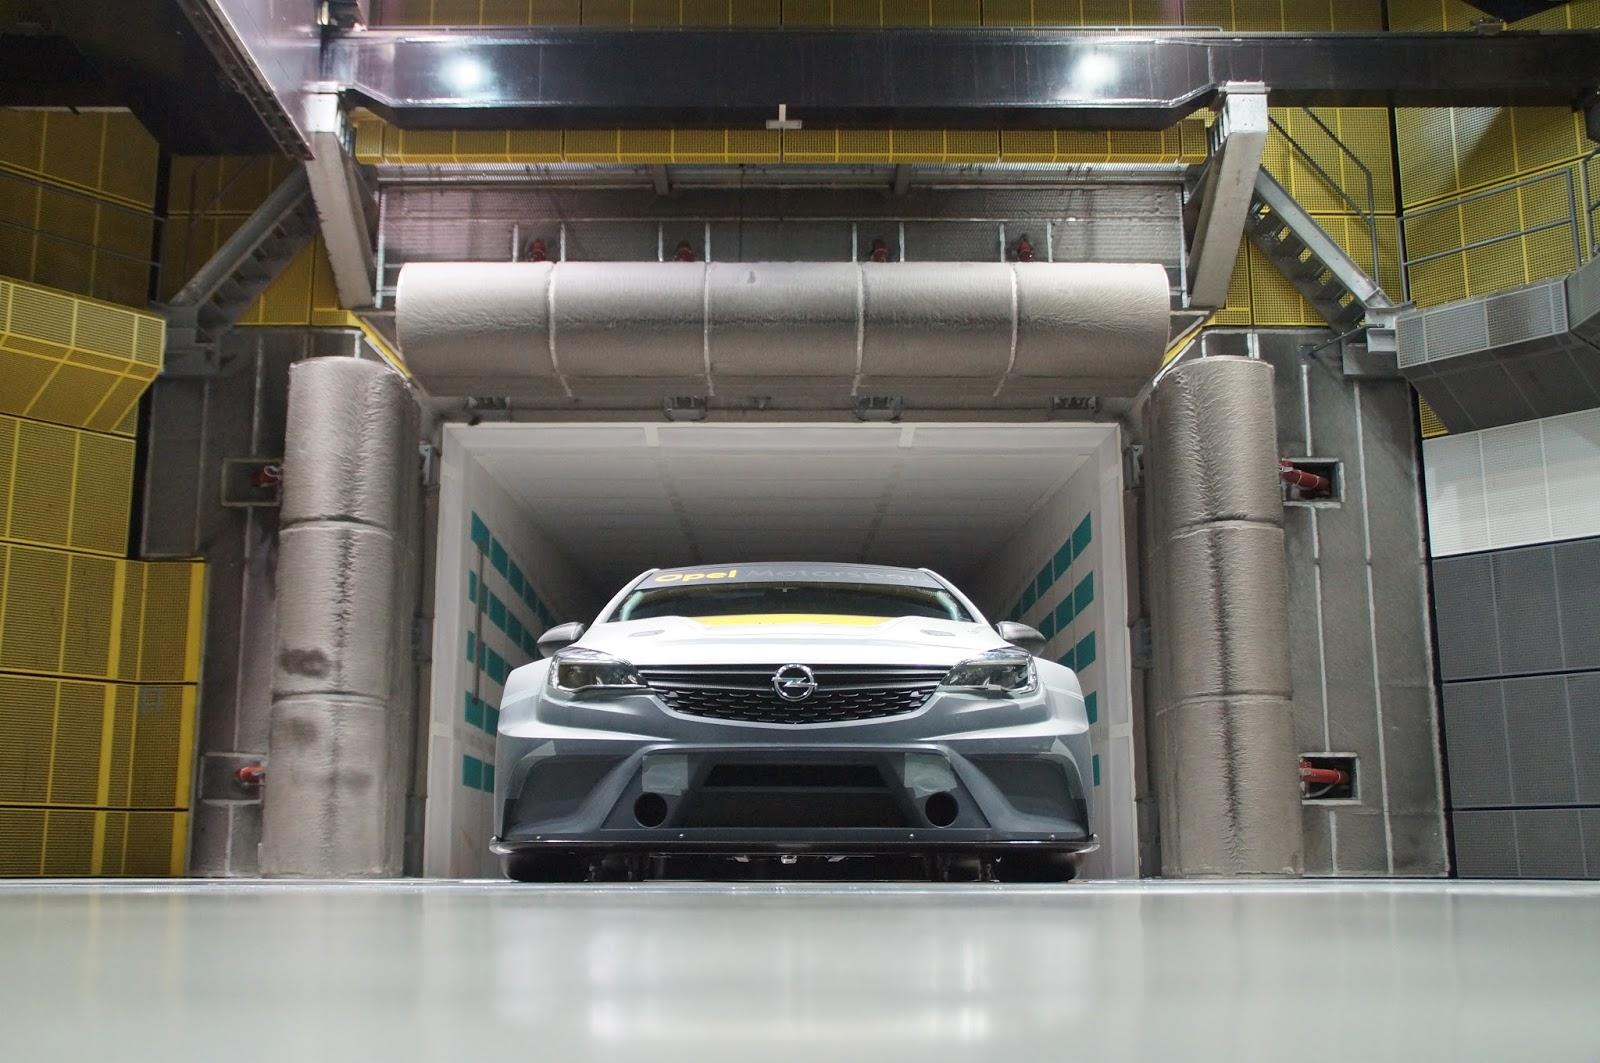 Opel Astra TCR 300281 Τελειοποιώντας την αεροδυναμική του Astra Opel, Opel Astra, Opel Astra TCR, Rally, Τεχνολογία